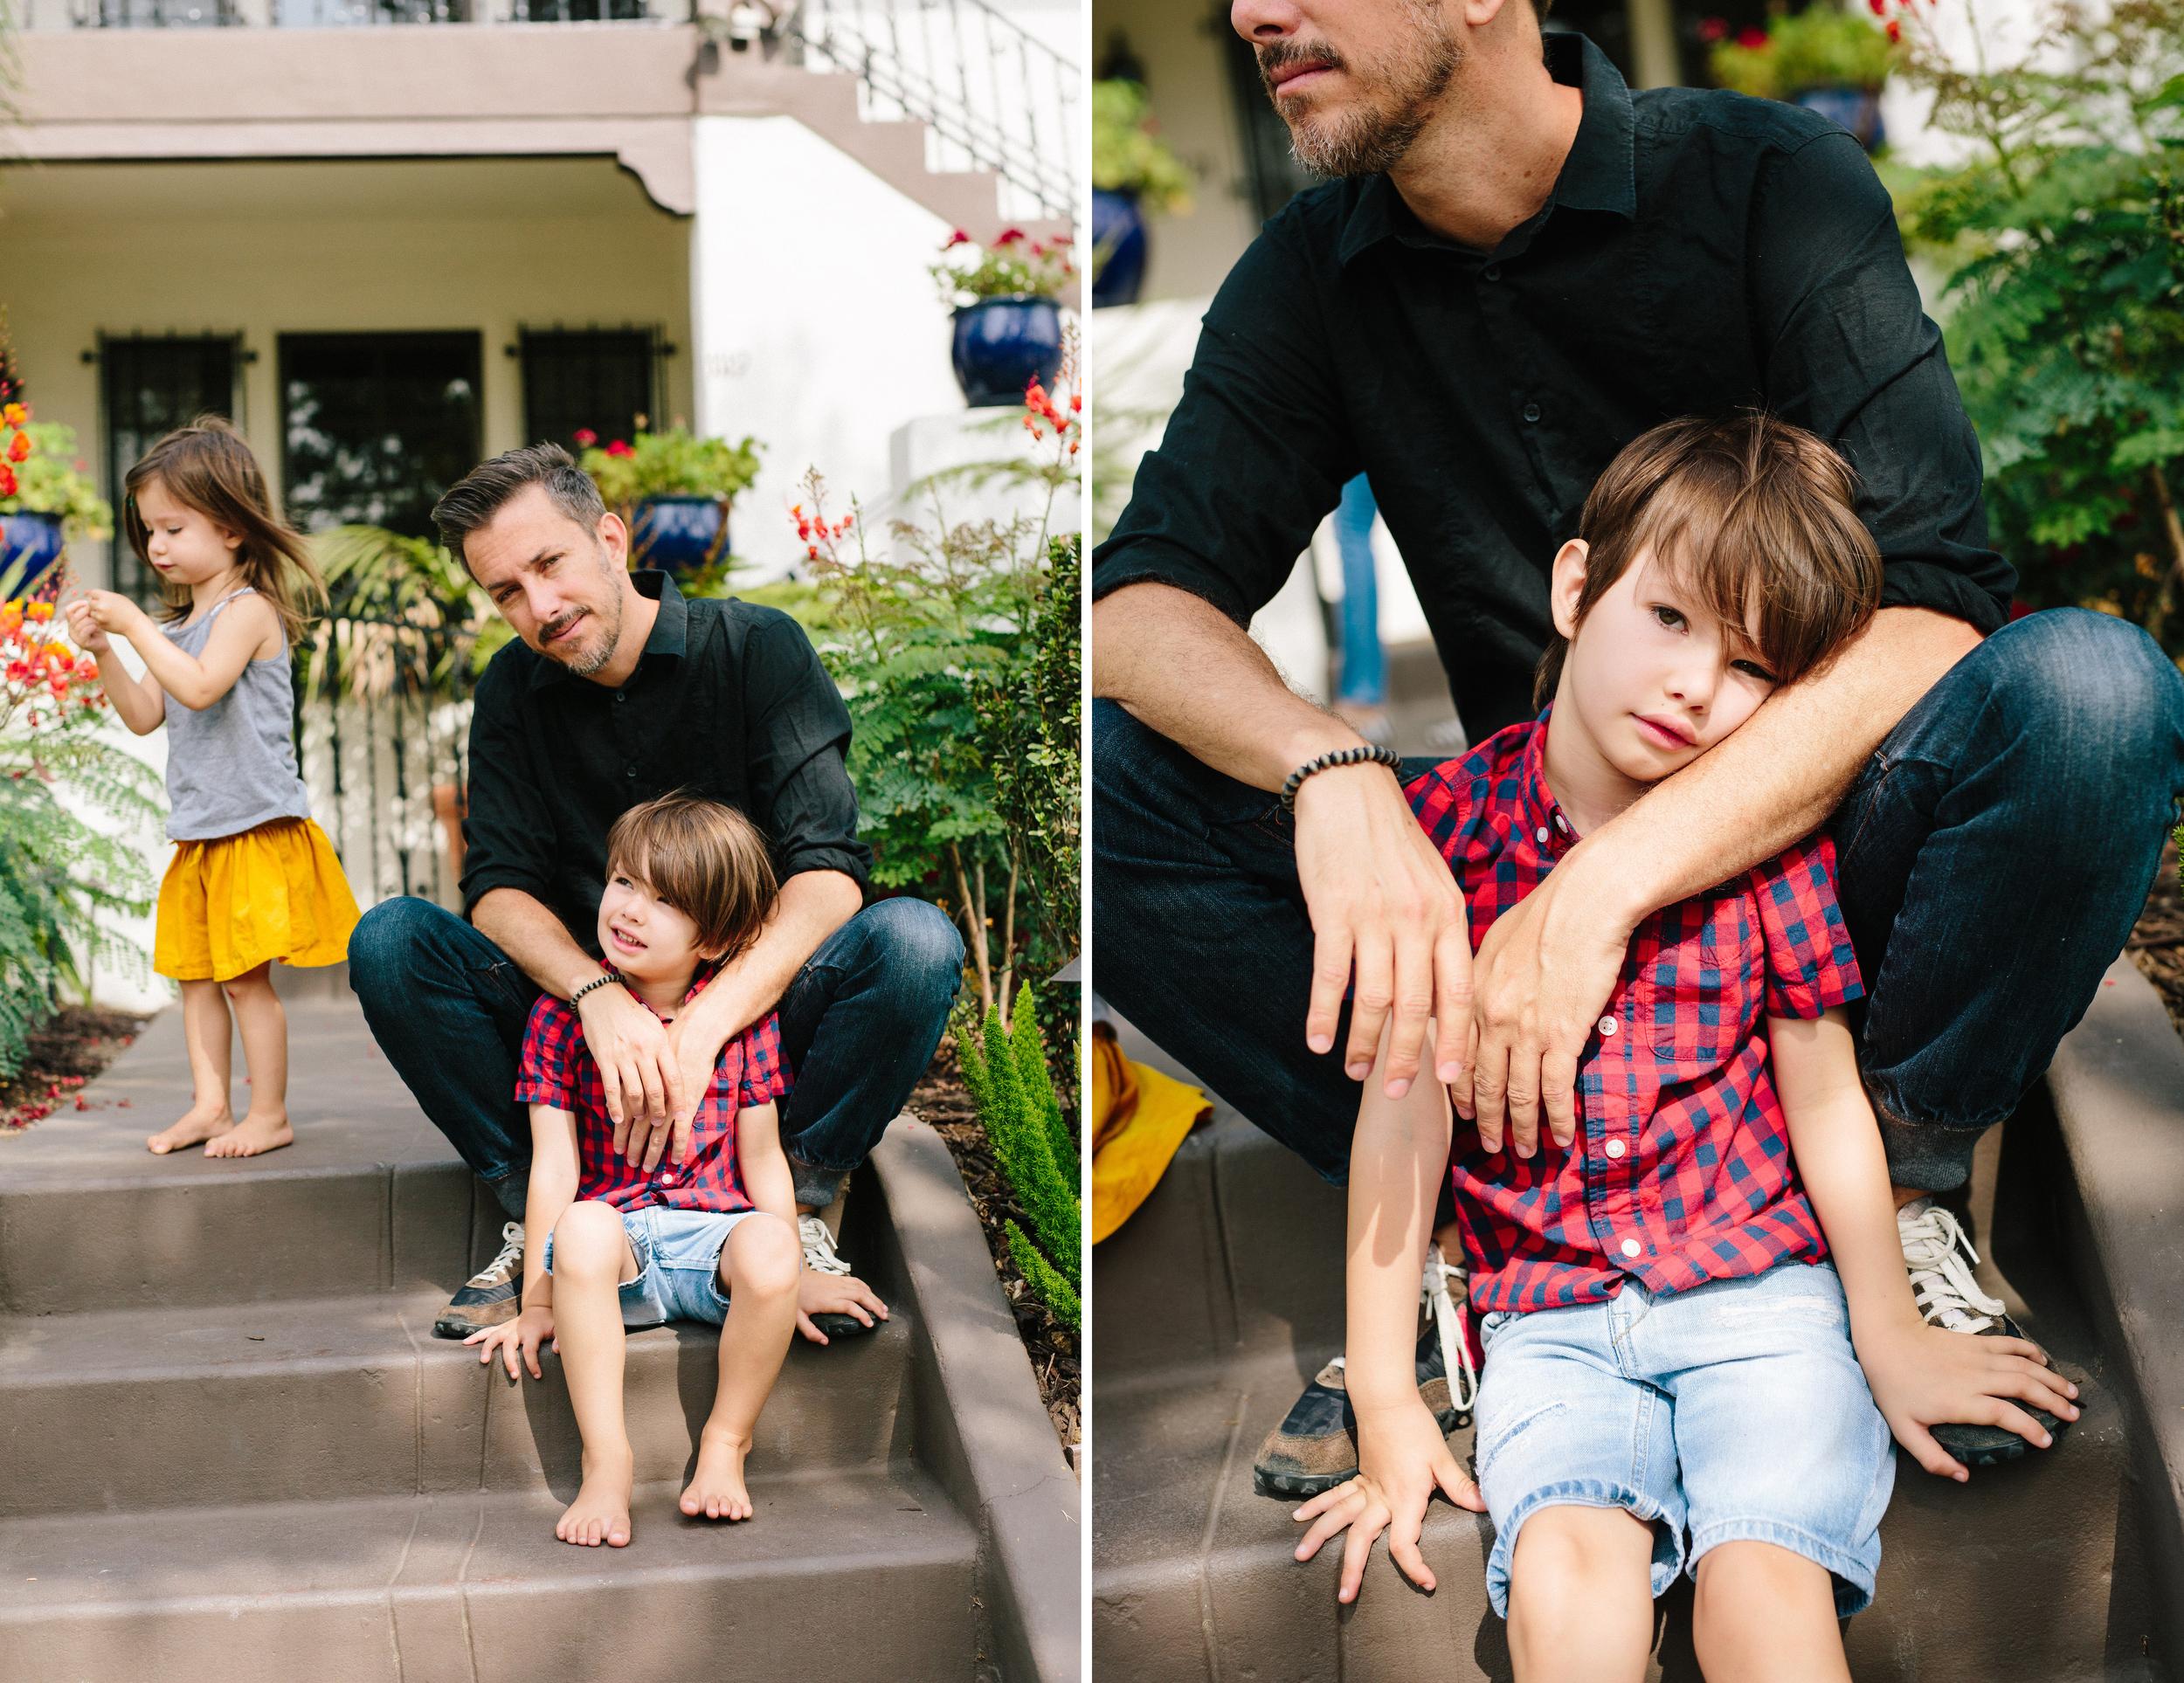 los-angeles-lifestyle-family-child-kid-baby-photographer_3.jpg